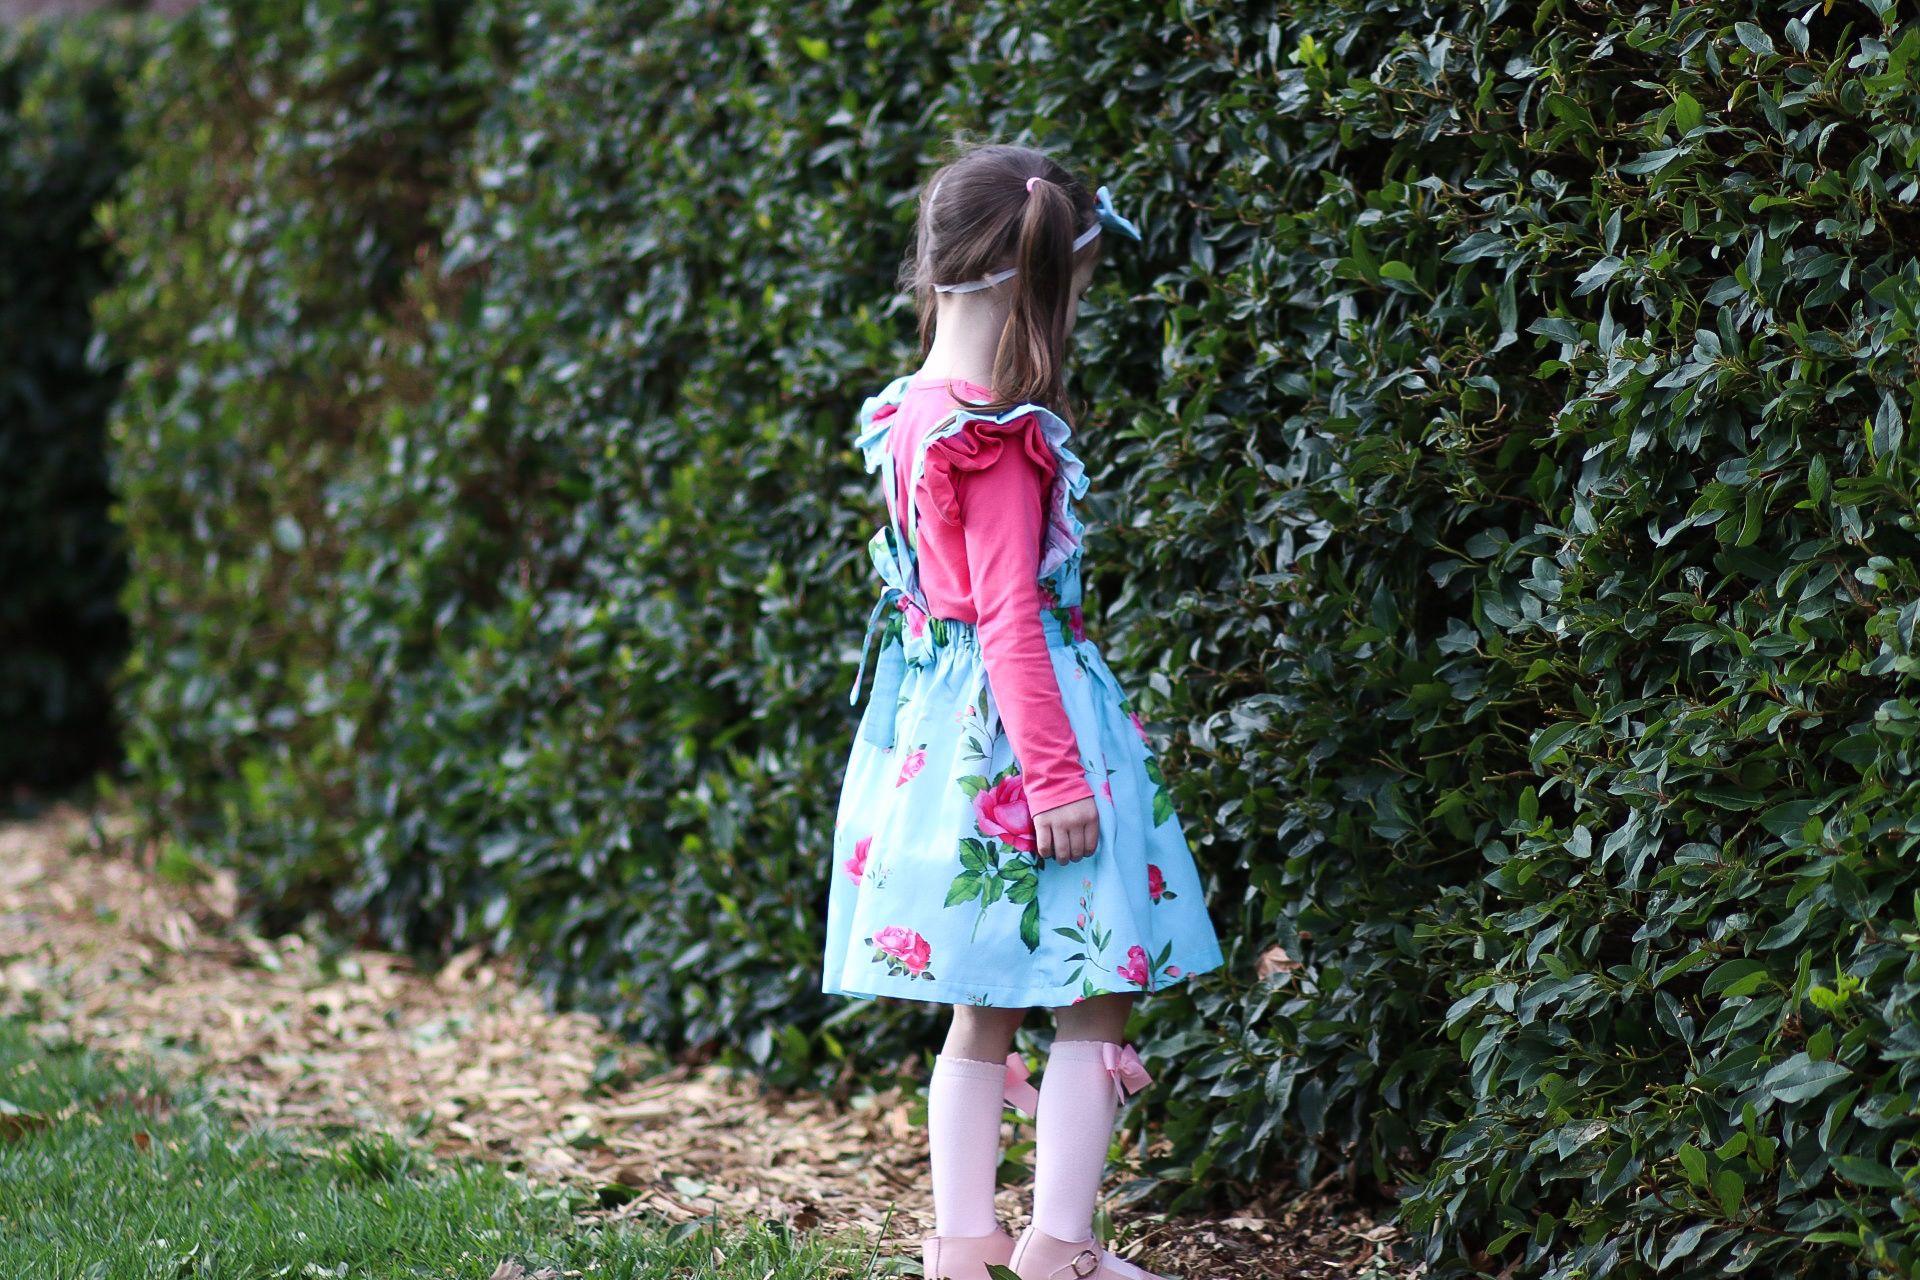 Gorgeous girl in flutter pinny